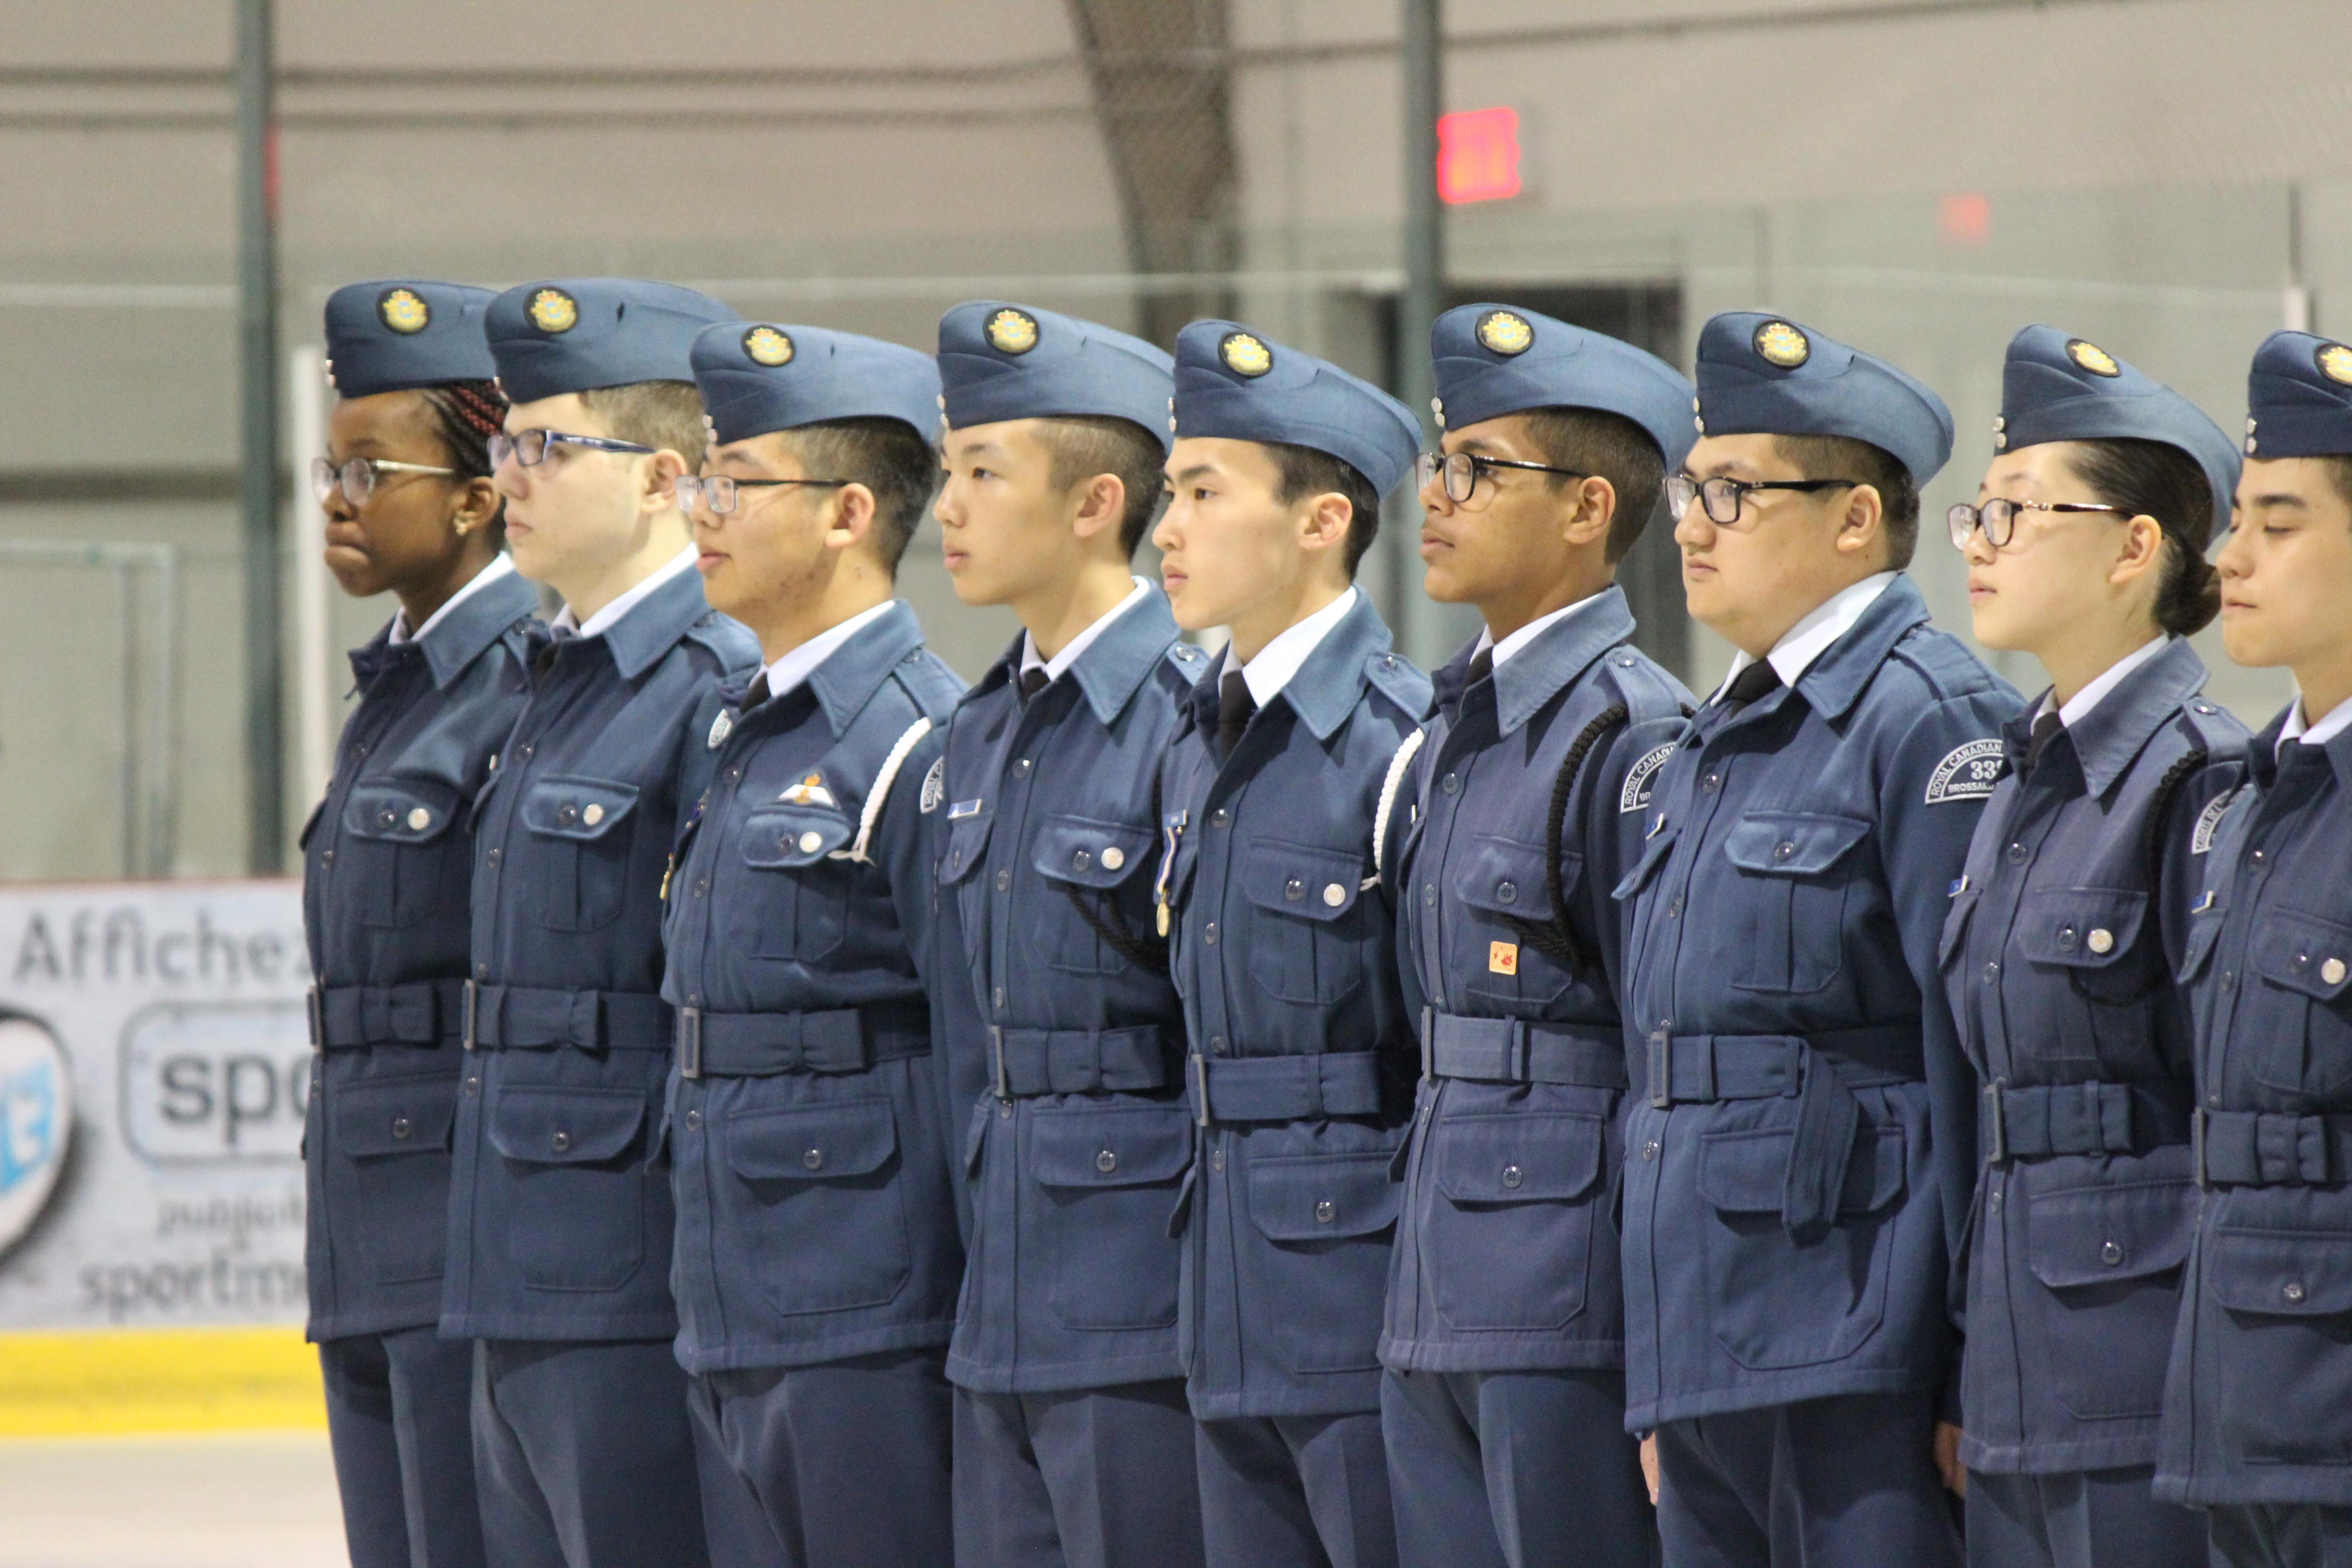 Cadet Uniform Clothing